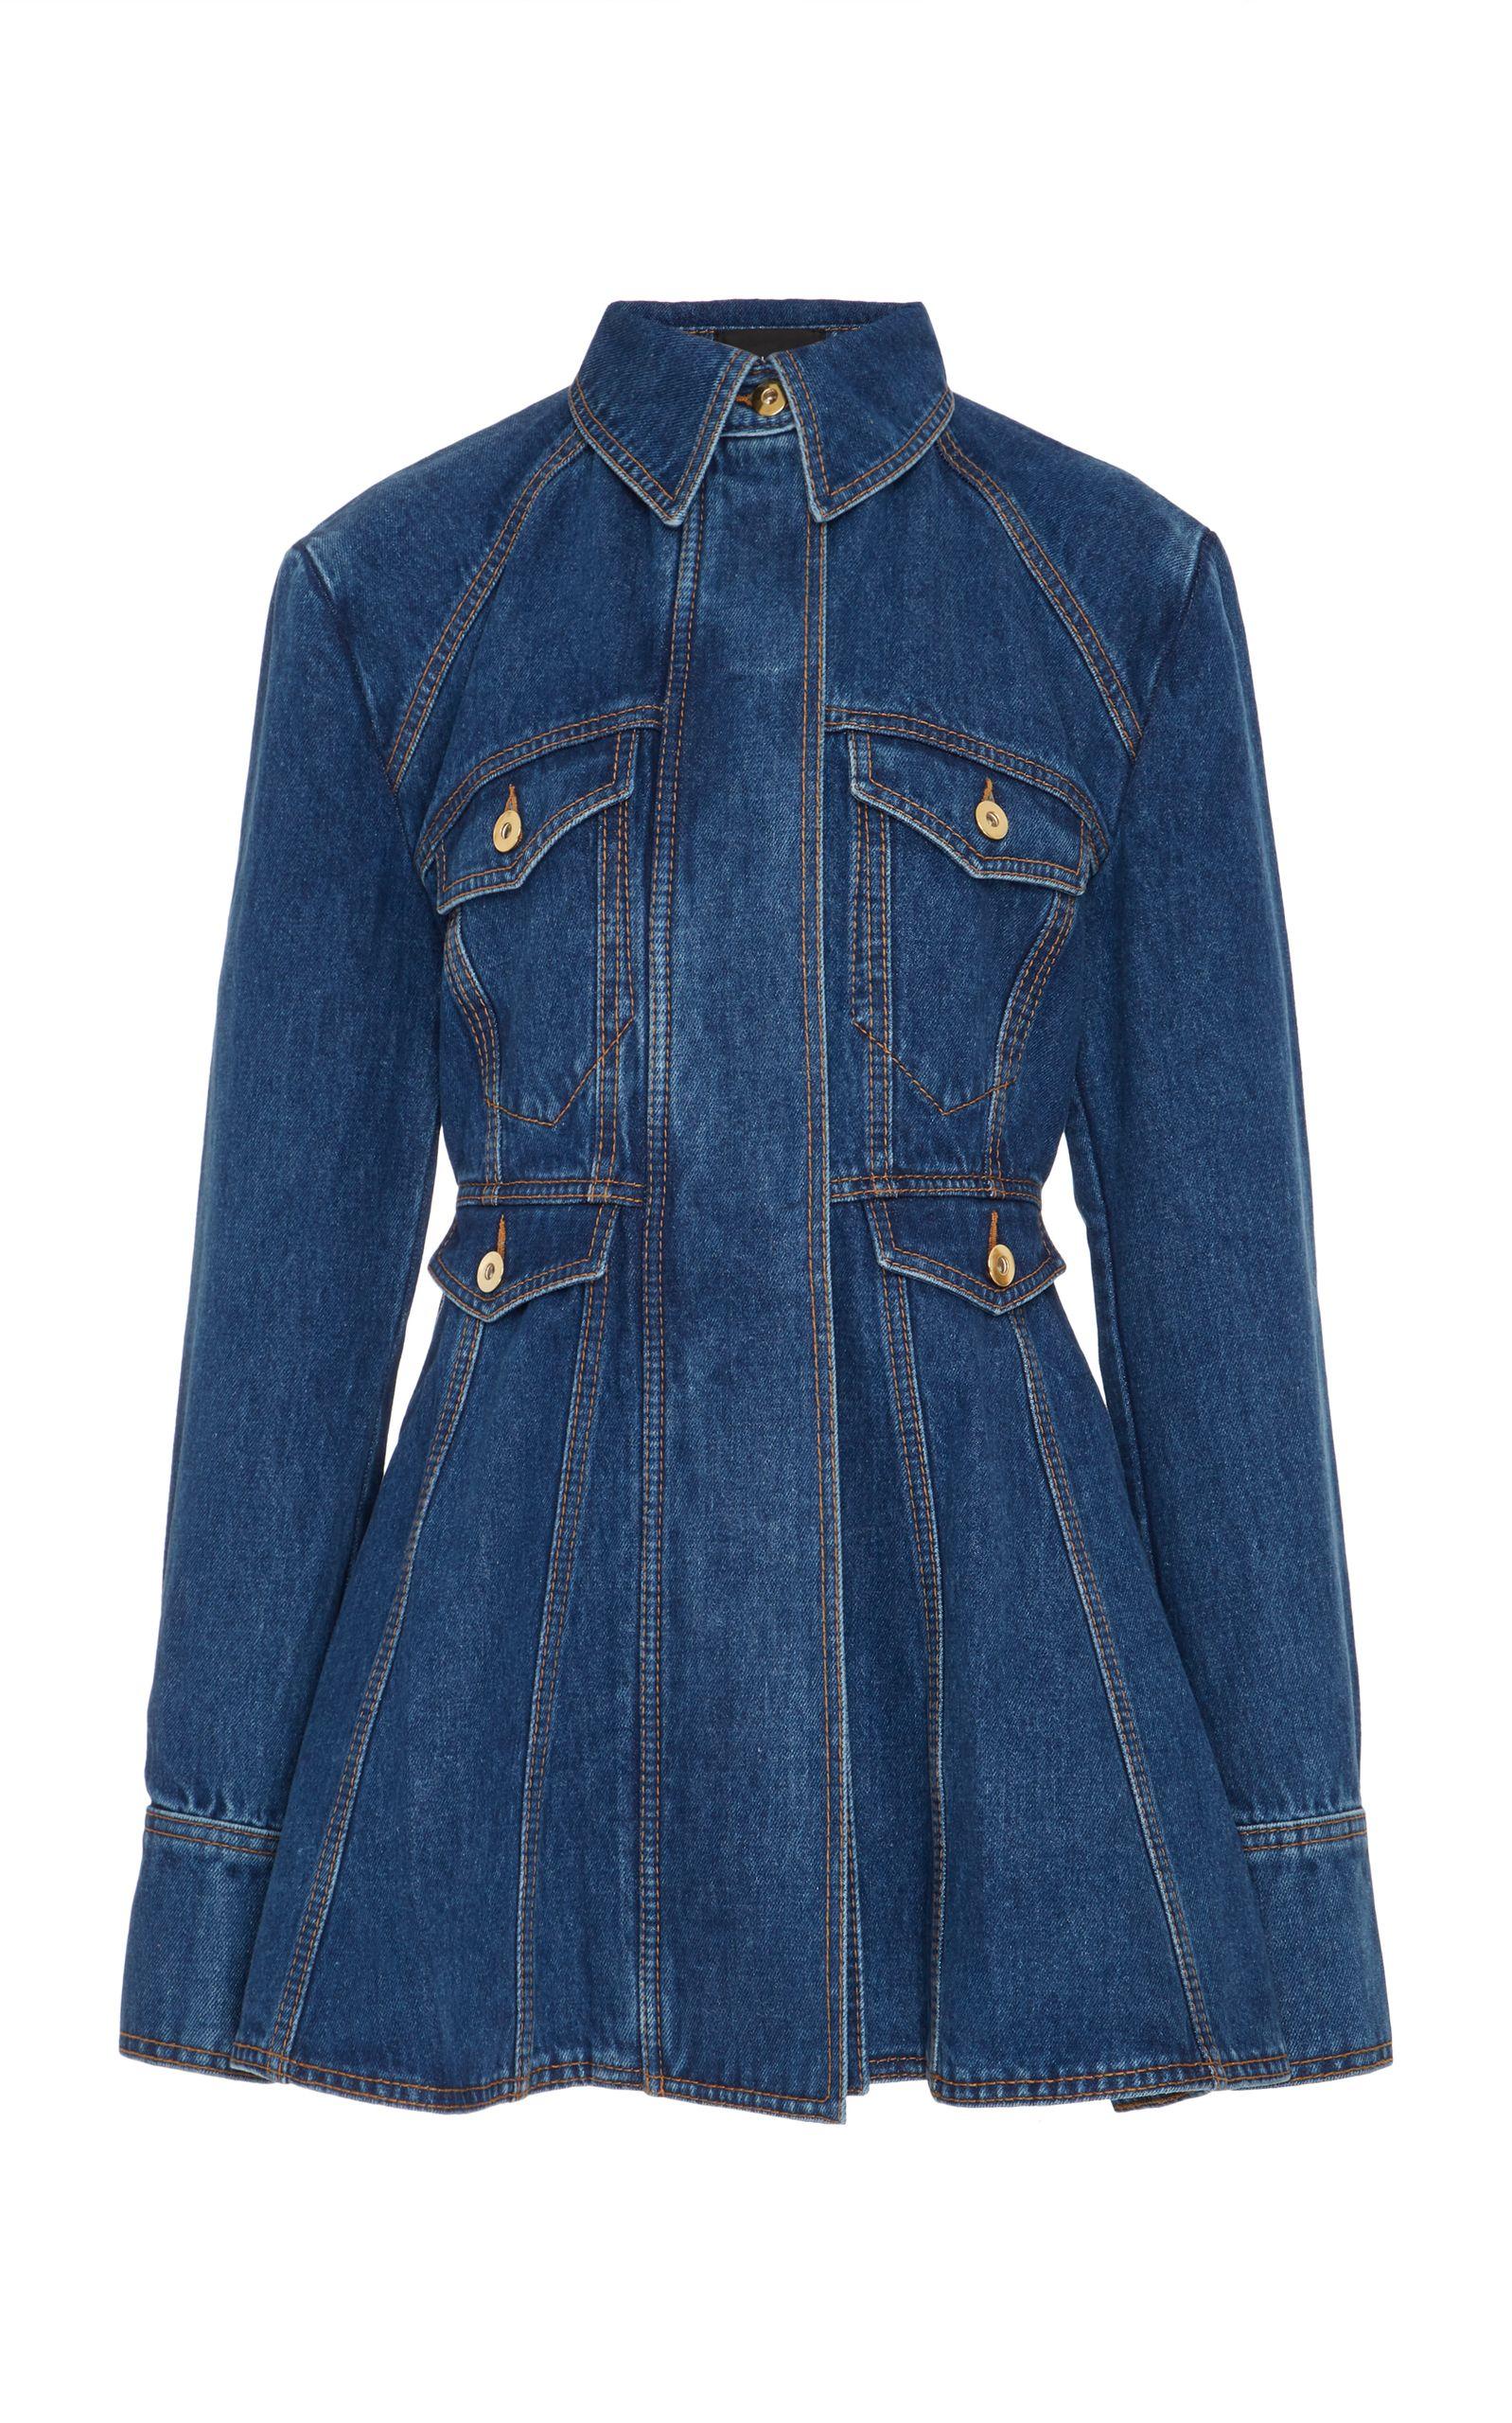 Ellery Waymon Flared Denim Jacket Modesens Denim Flares Denim Jacket Peplum Jacket Outfit [ 2560 x 1598 Pixel ]